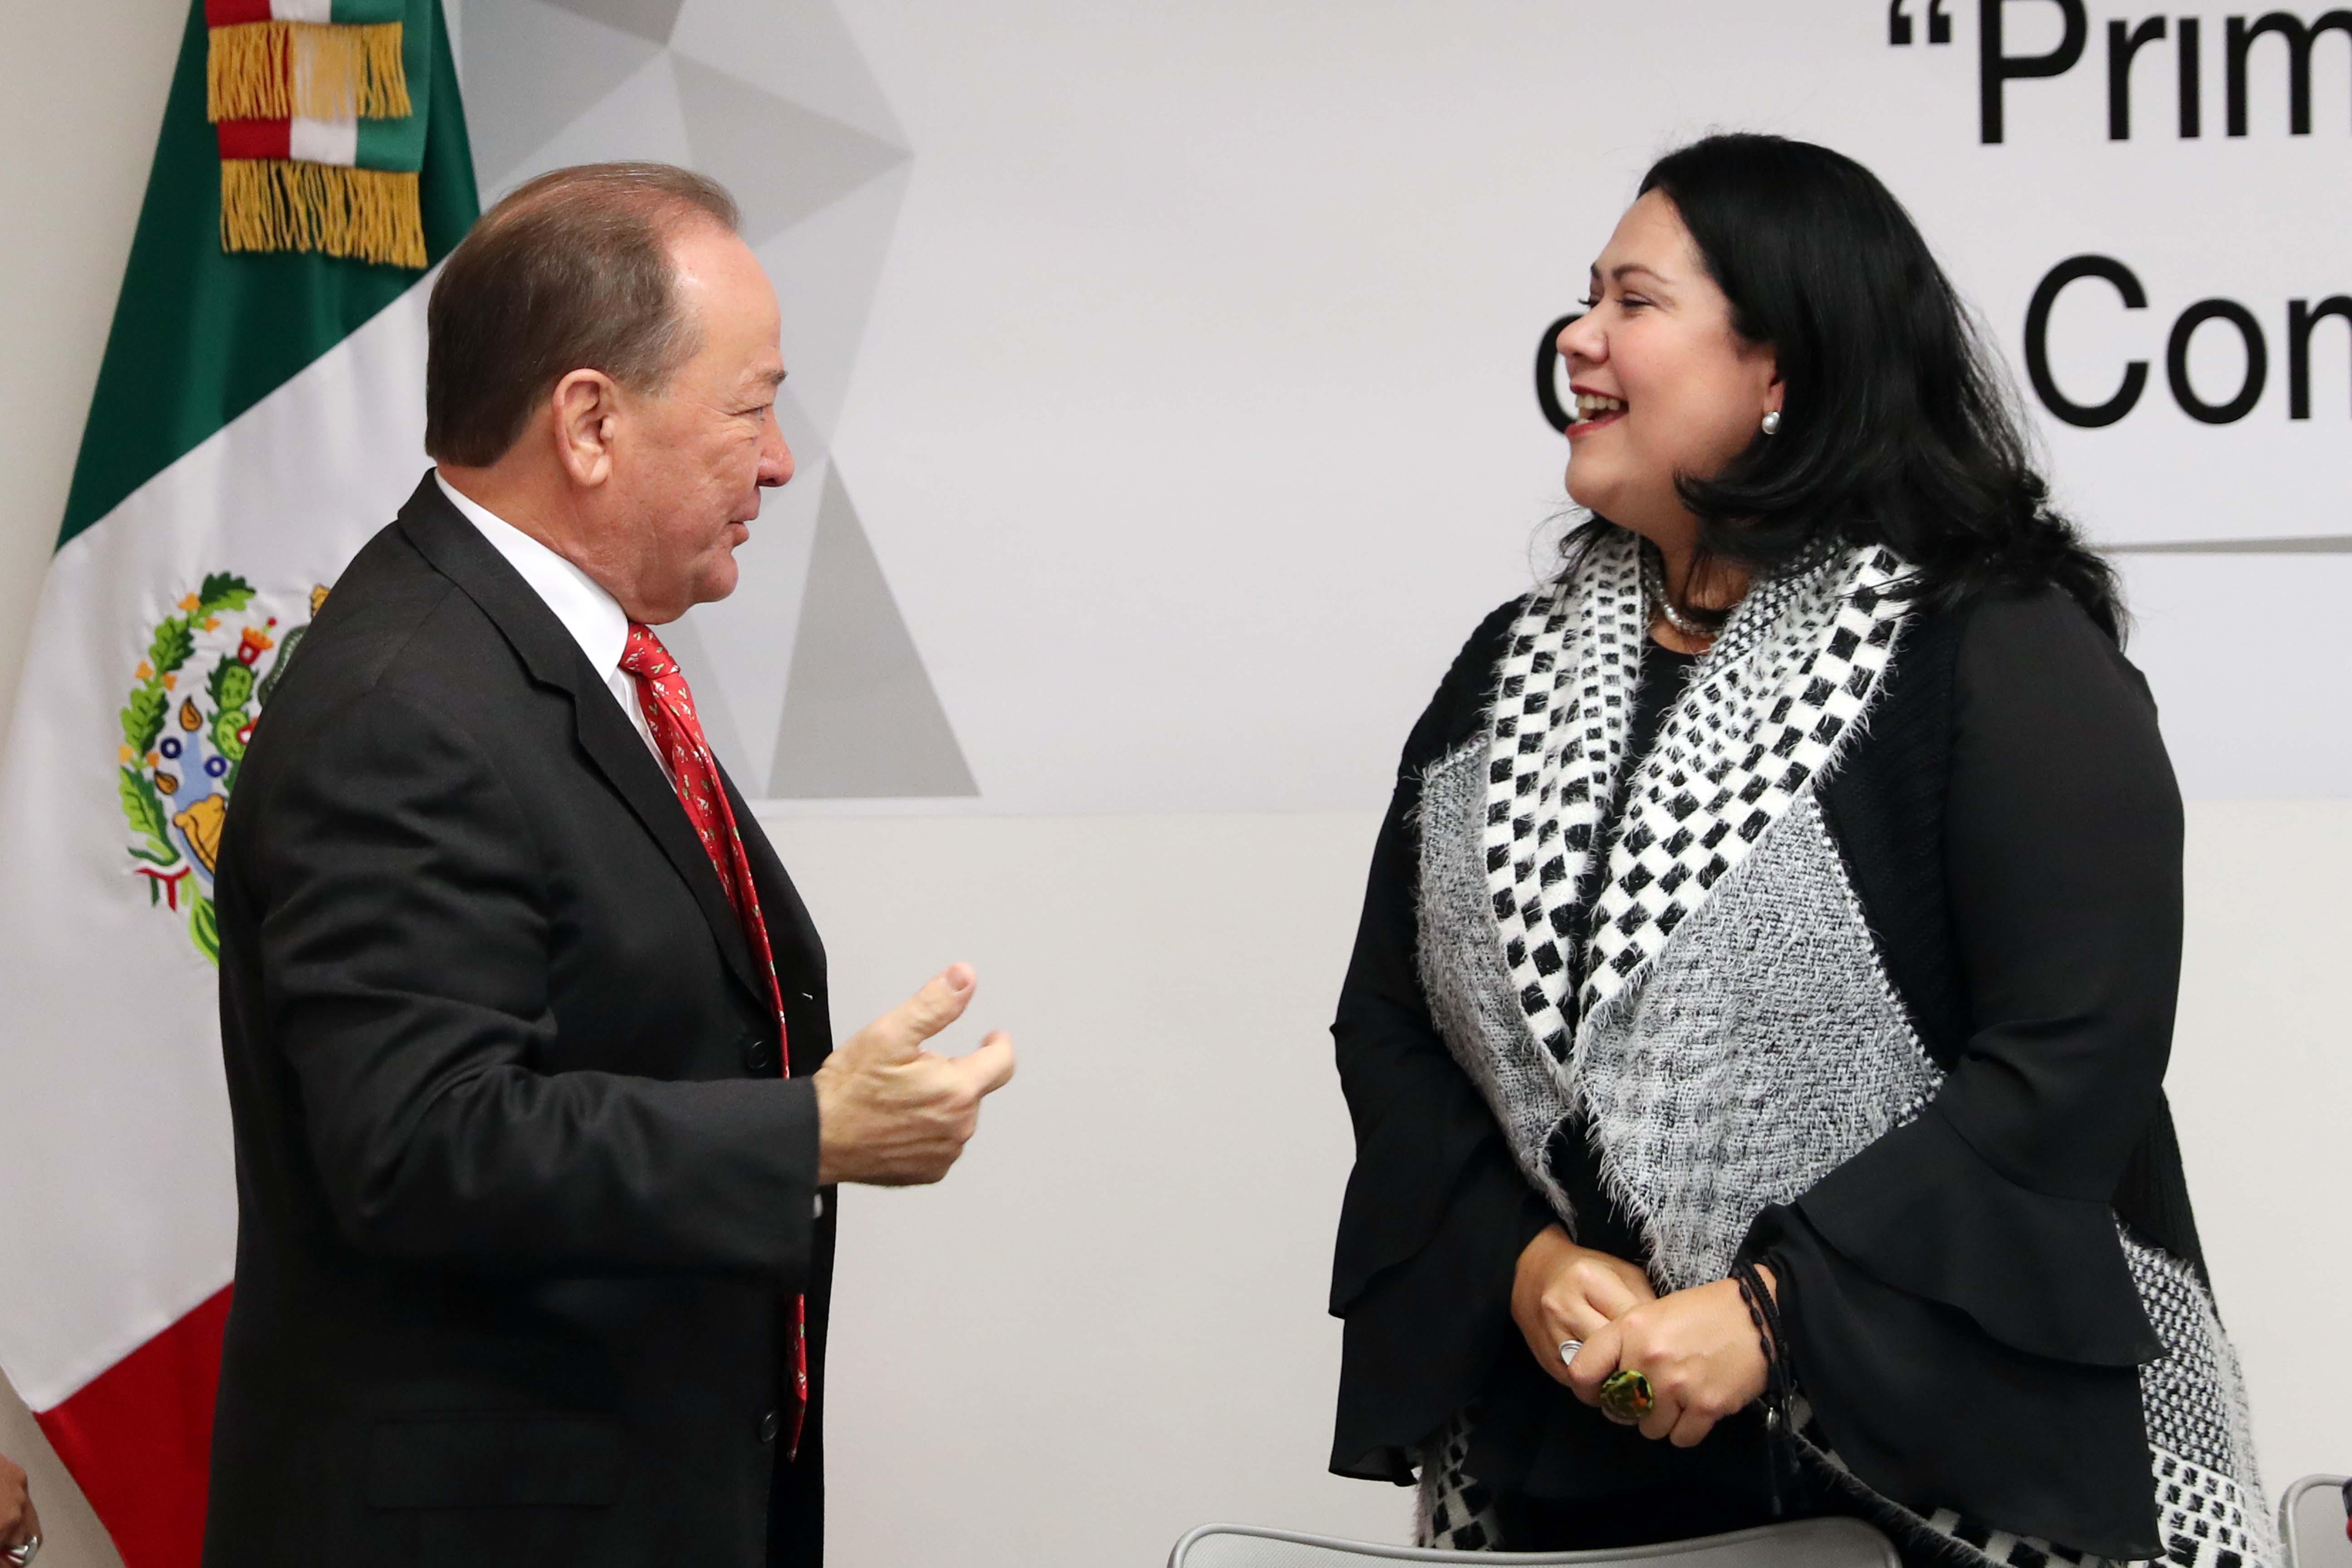 Se reúne Comisión de Reforma Agraria con representante de la FAO en México